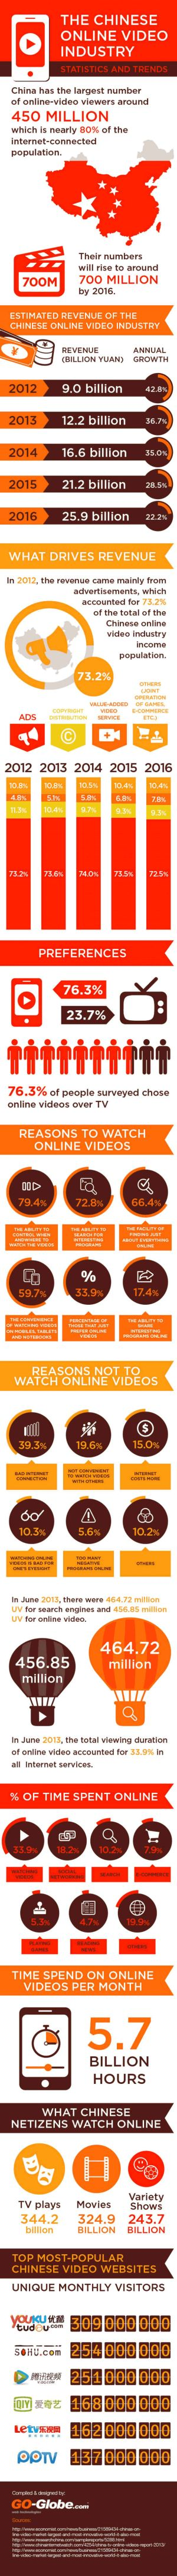 online-video-market-in-china-statistics